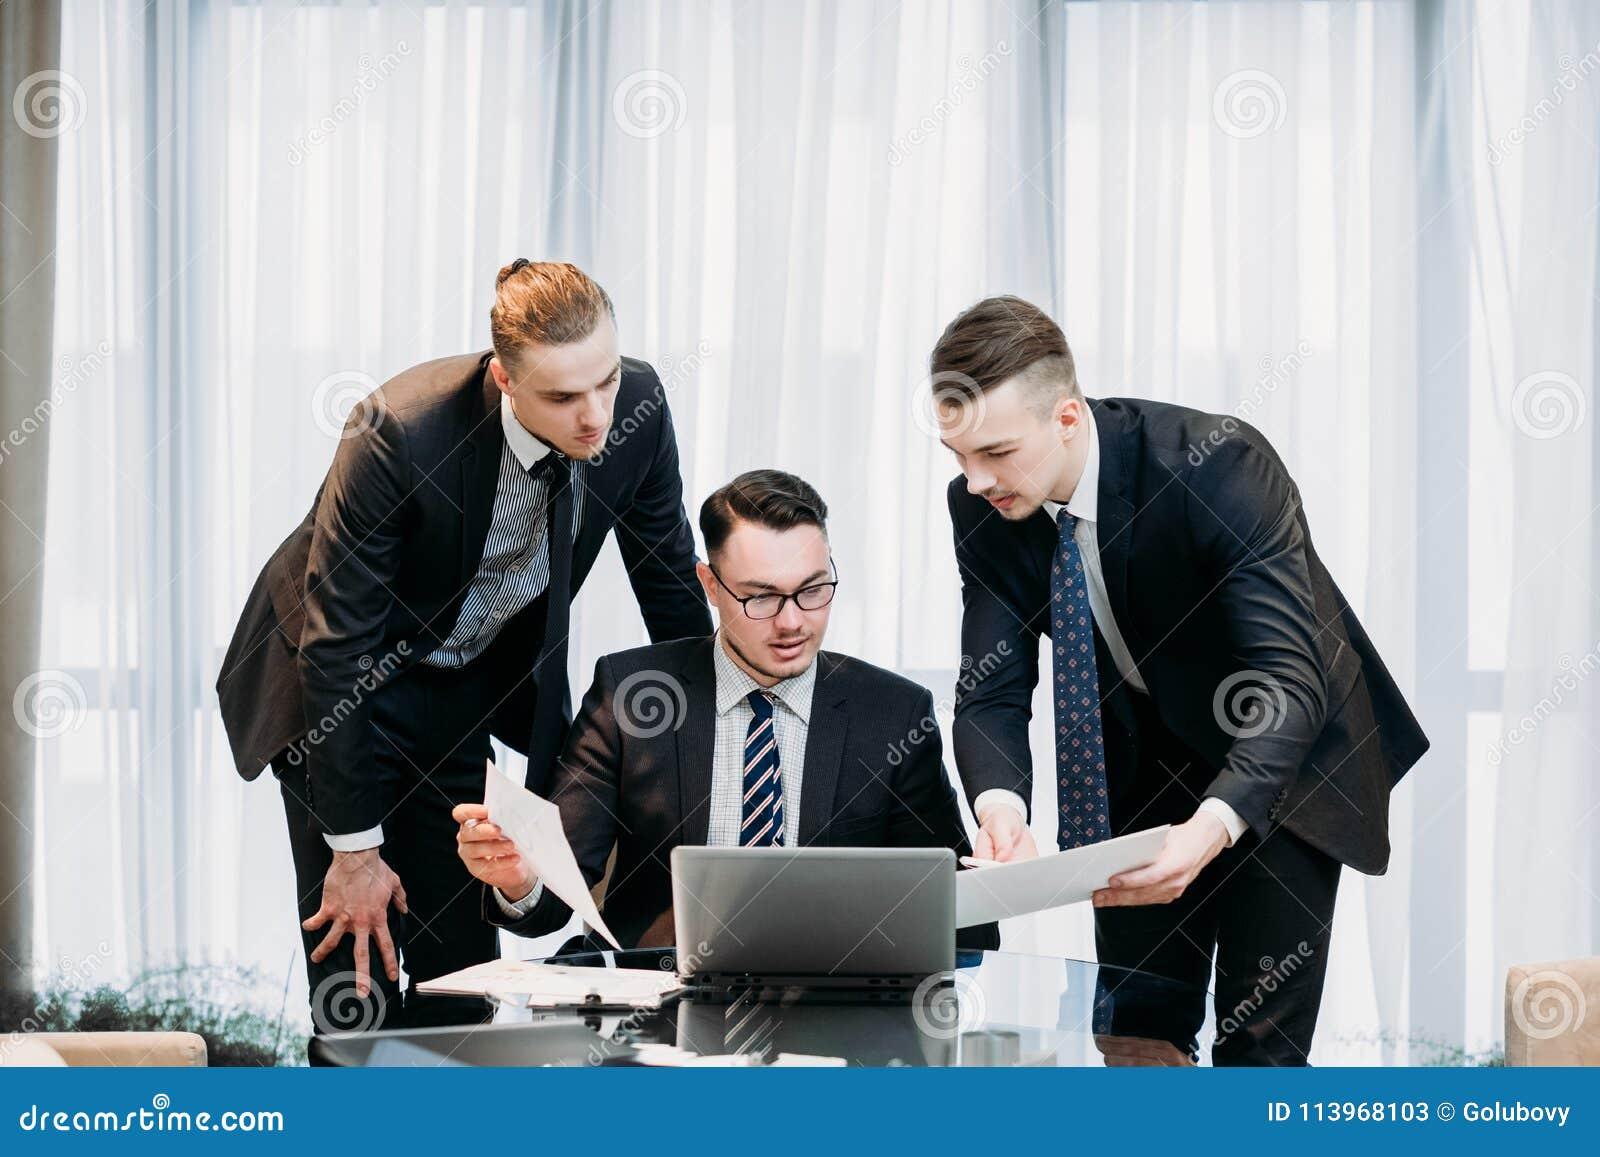 Successful team business men professional work